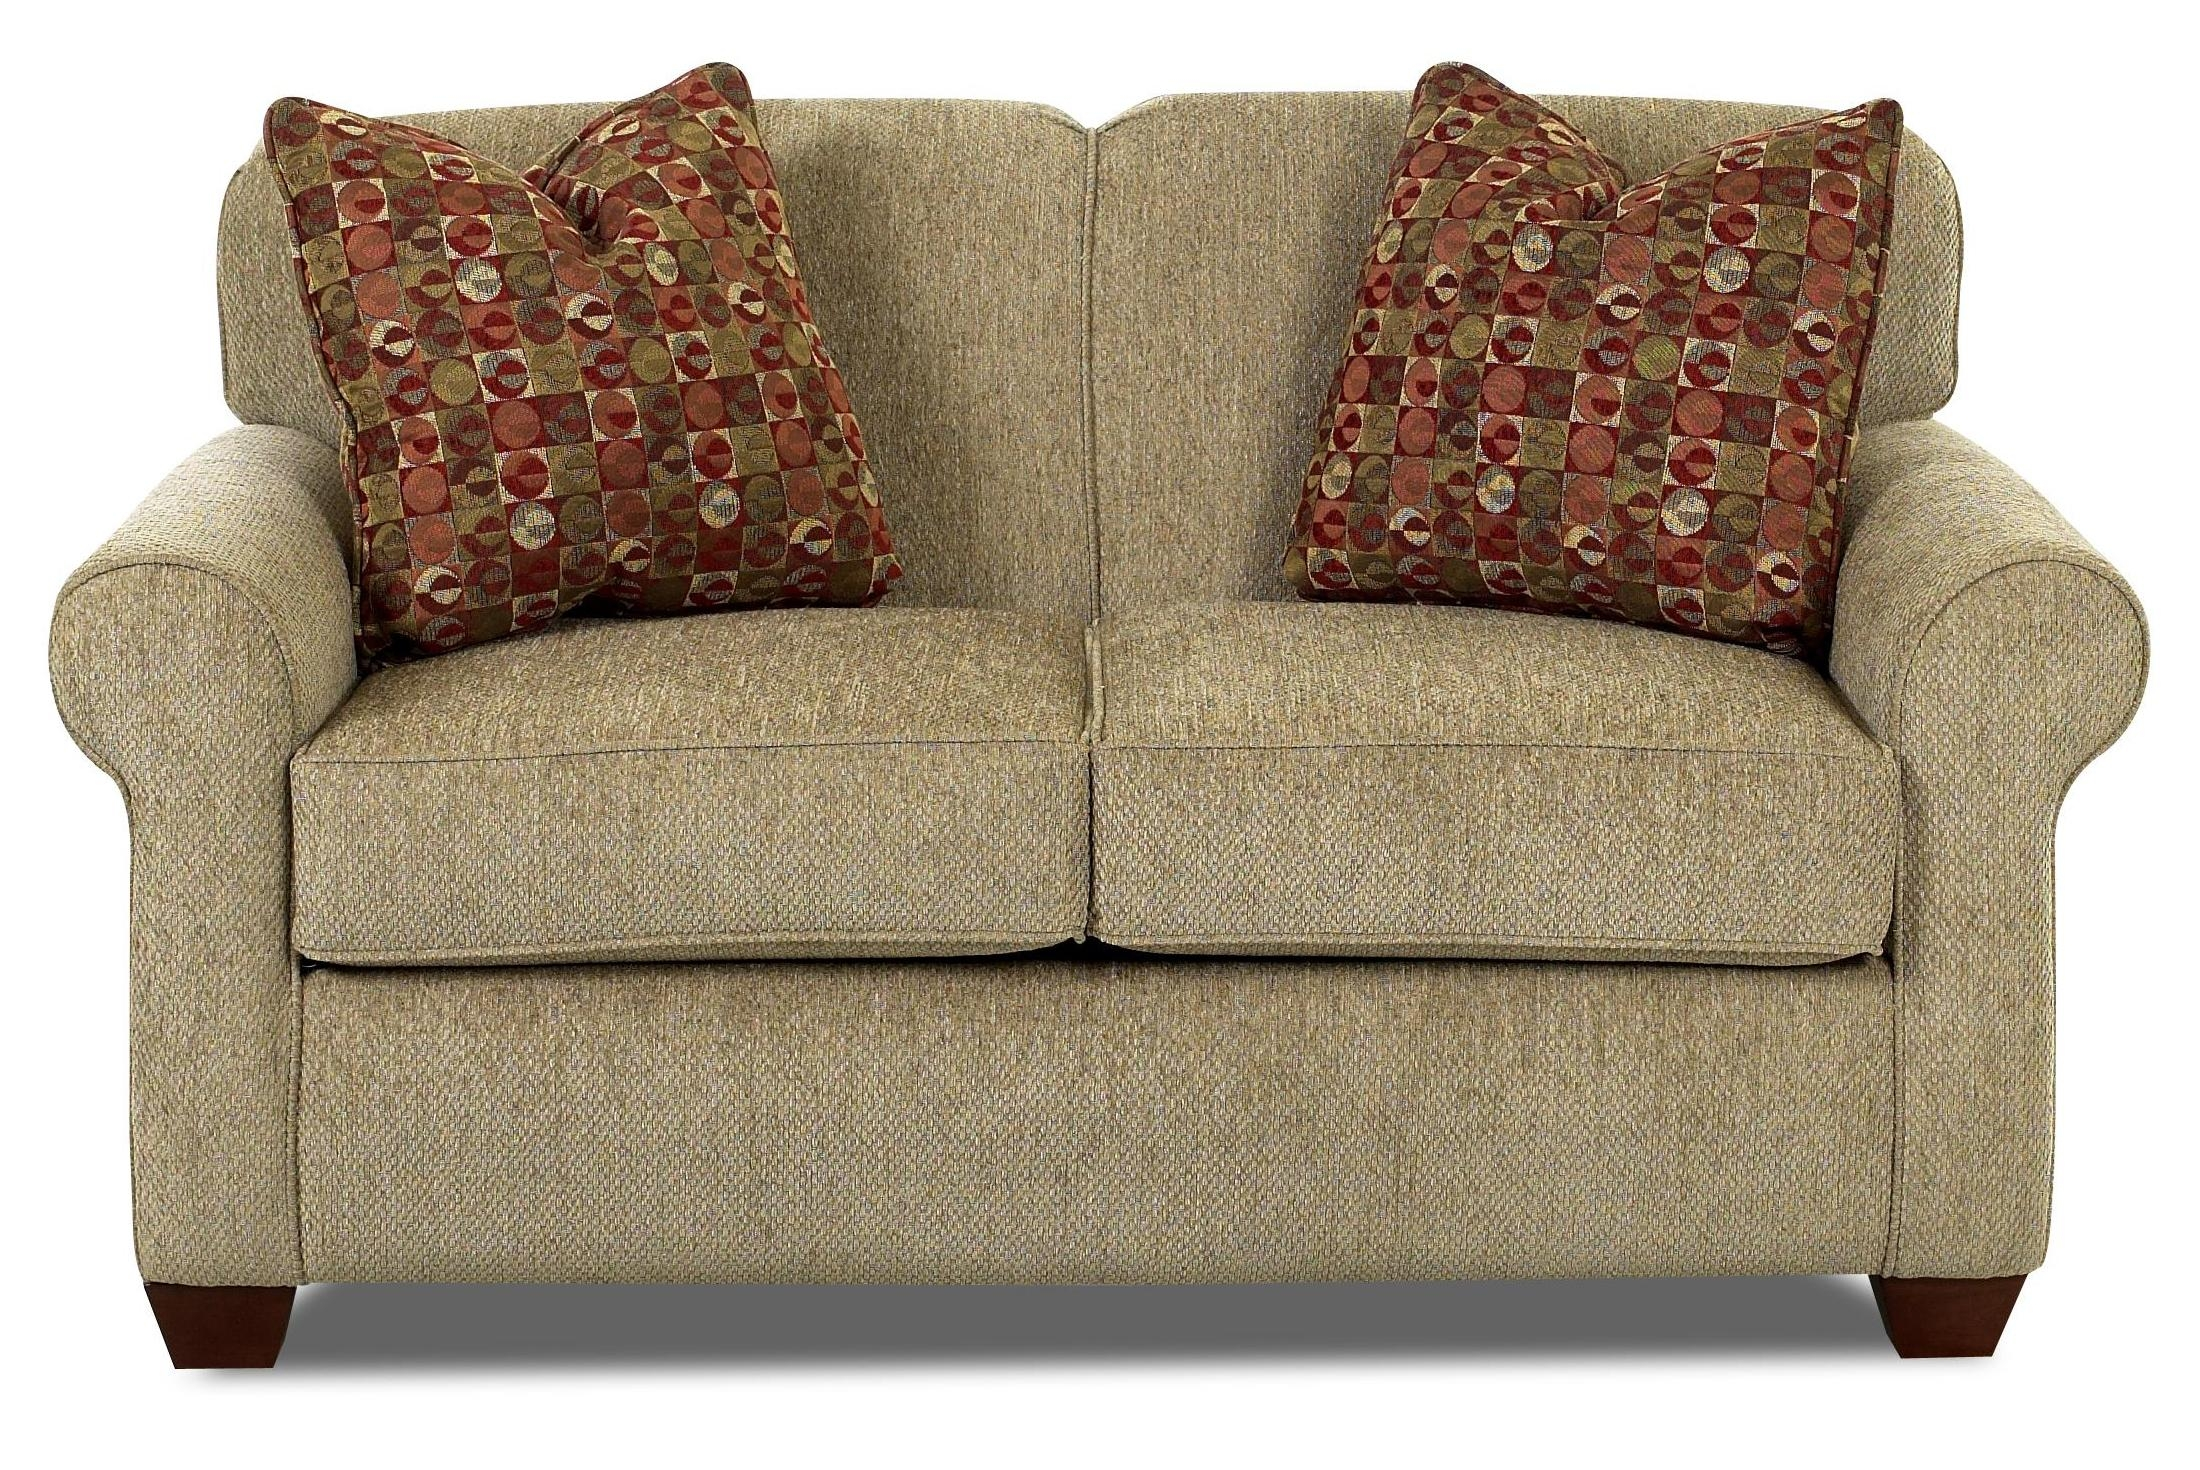 Sofas Center Sofa Craigslist Las Vegas Miami Athens Tri Fold In Craigslist Sleeper Sofa (Image 15 of 15)